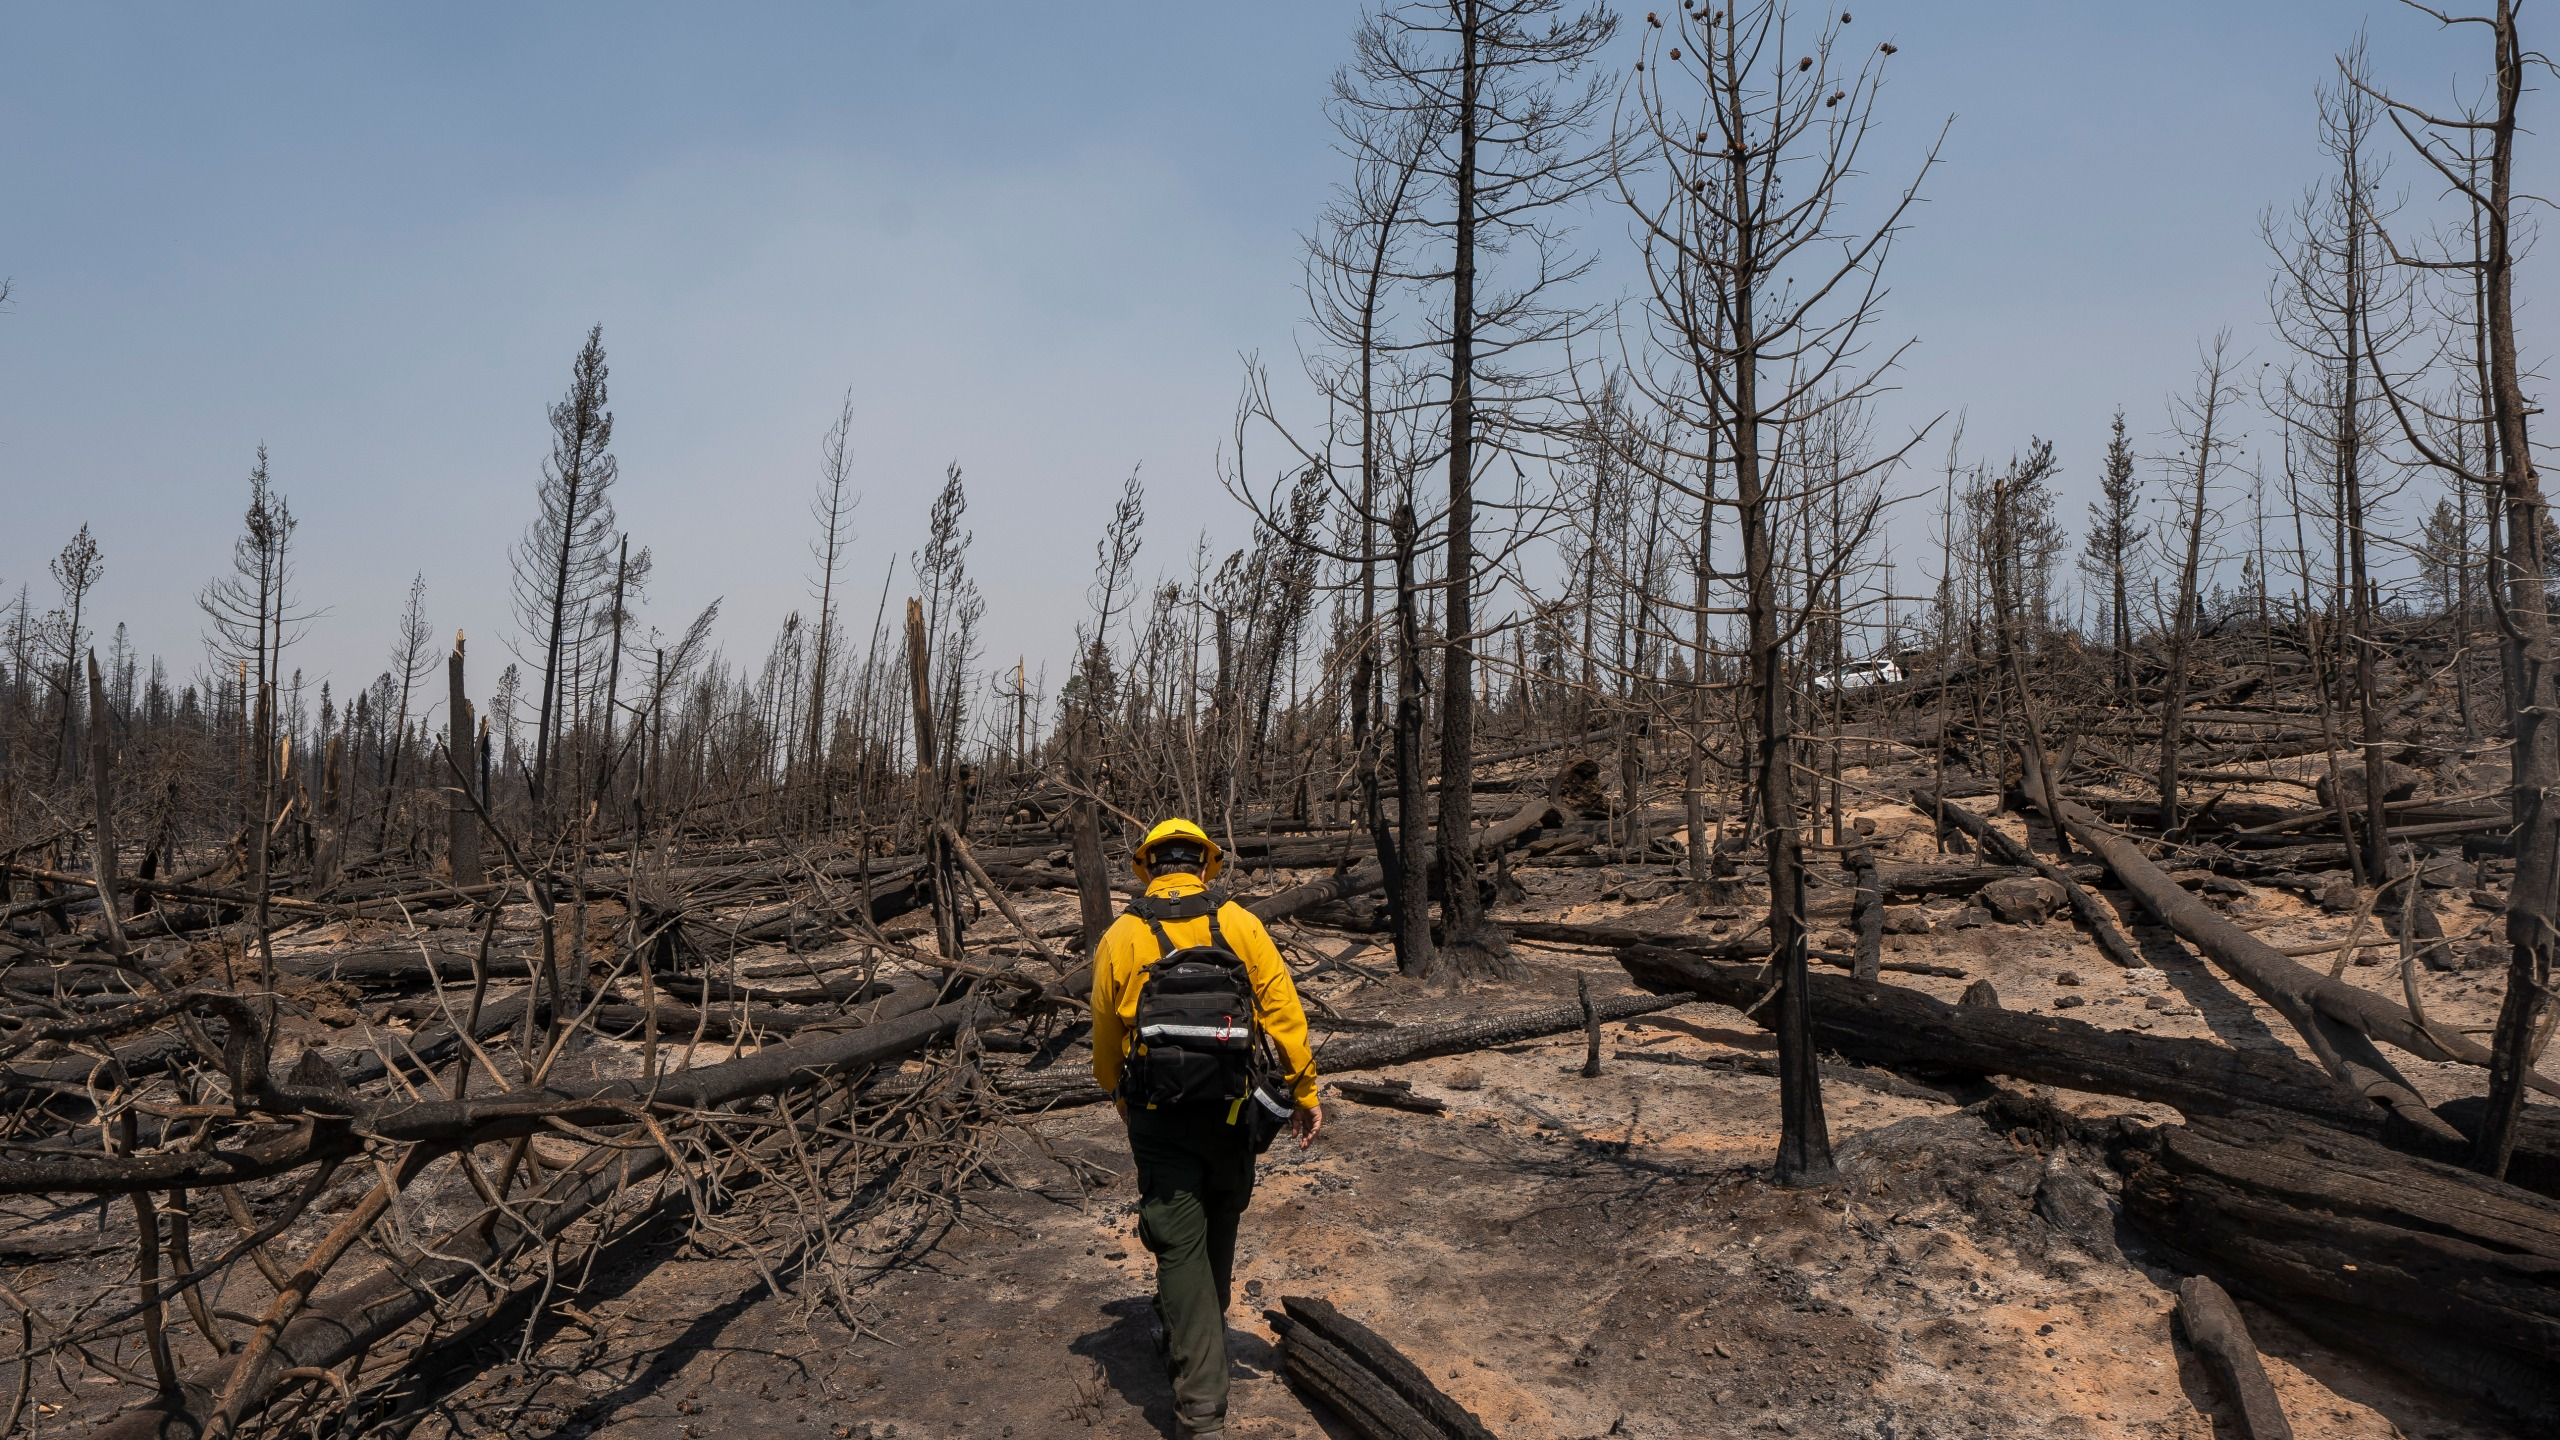 Marcus Kauffman, public information officer working on the Bootleg Fire, walks through burn damage July 23, 2021, near Paisley, Ore. (AP Photo/Nathan Howard)